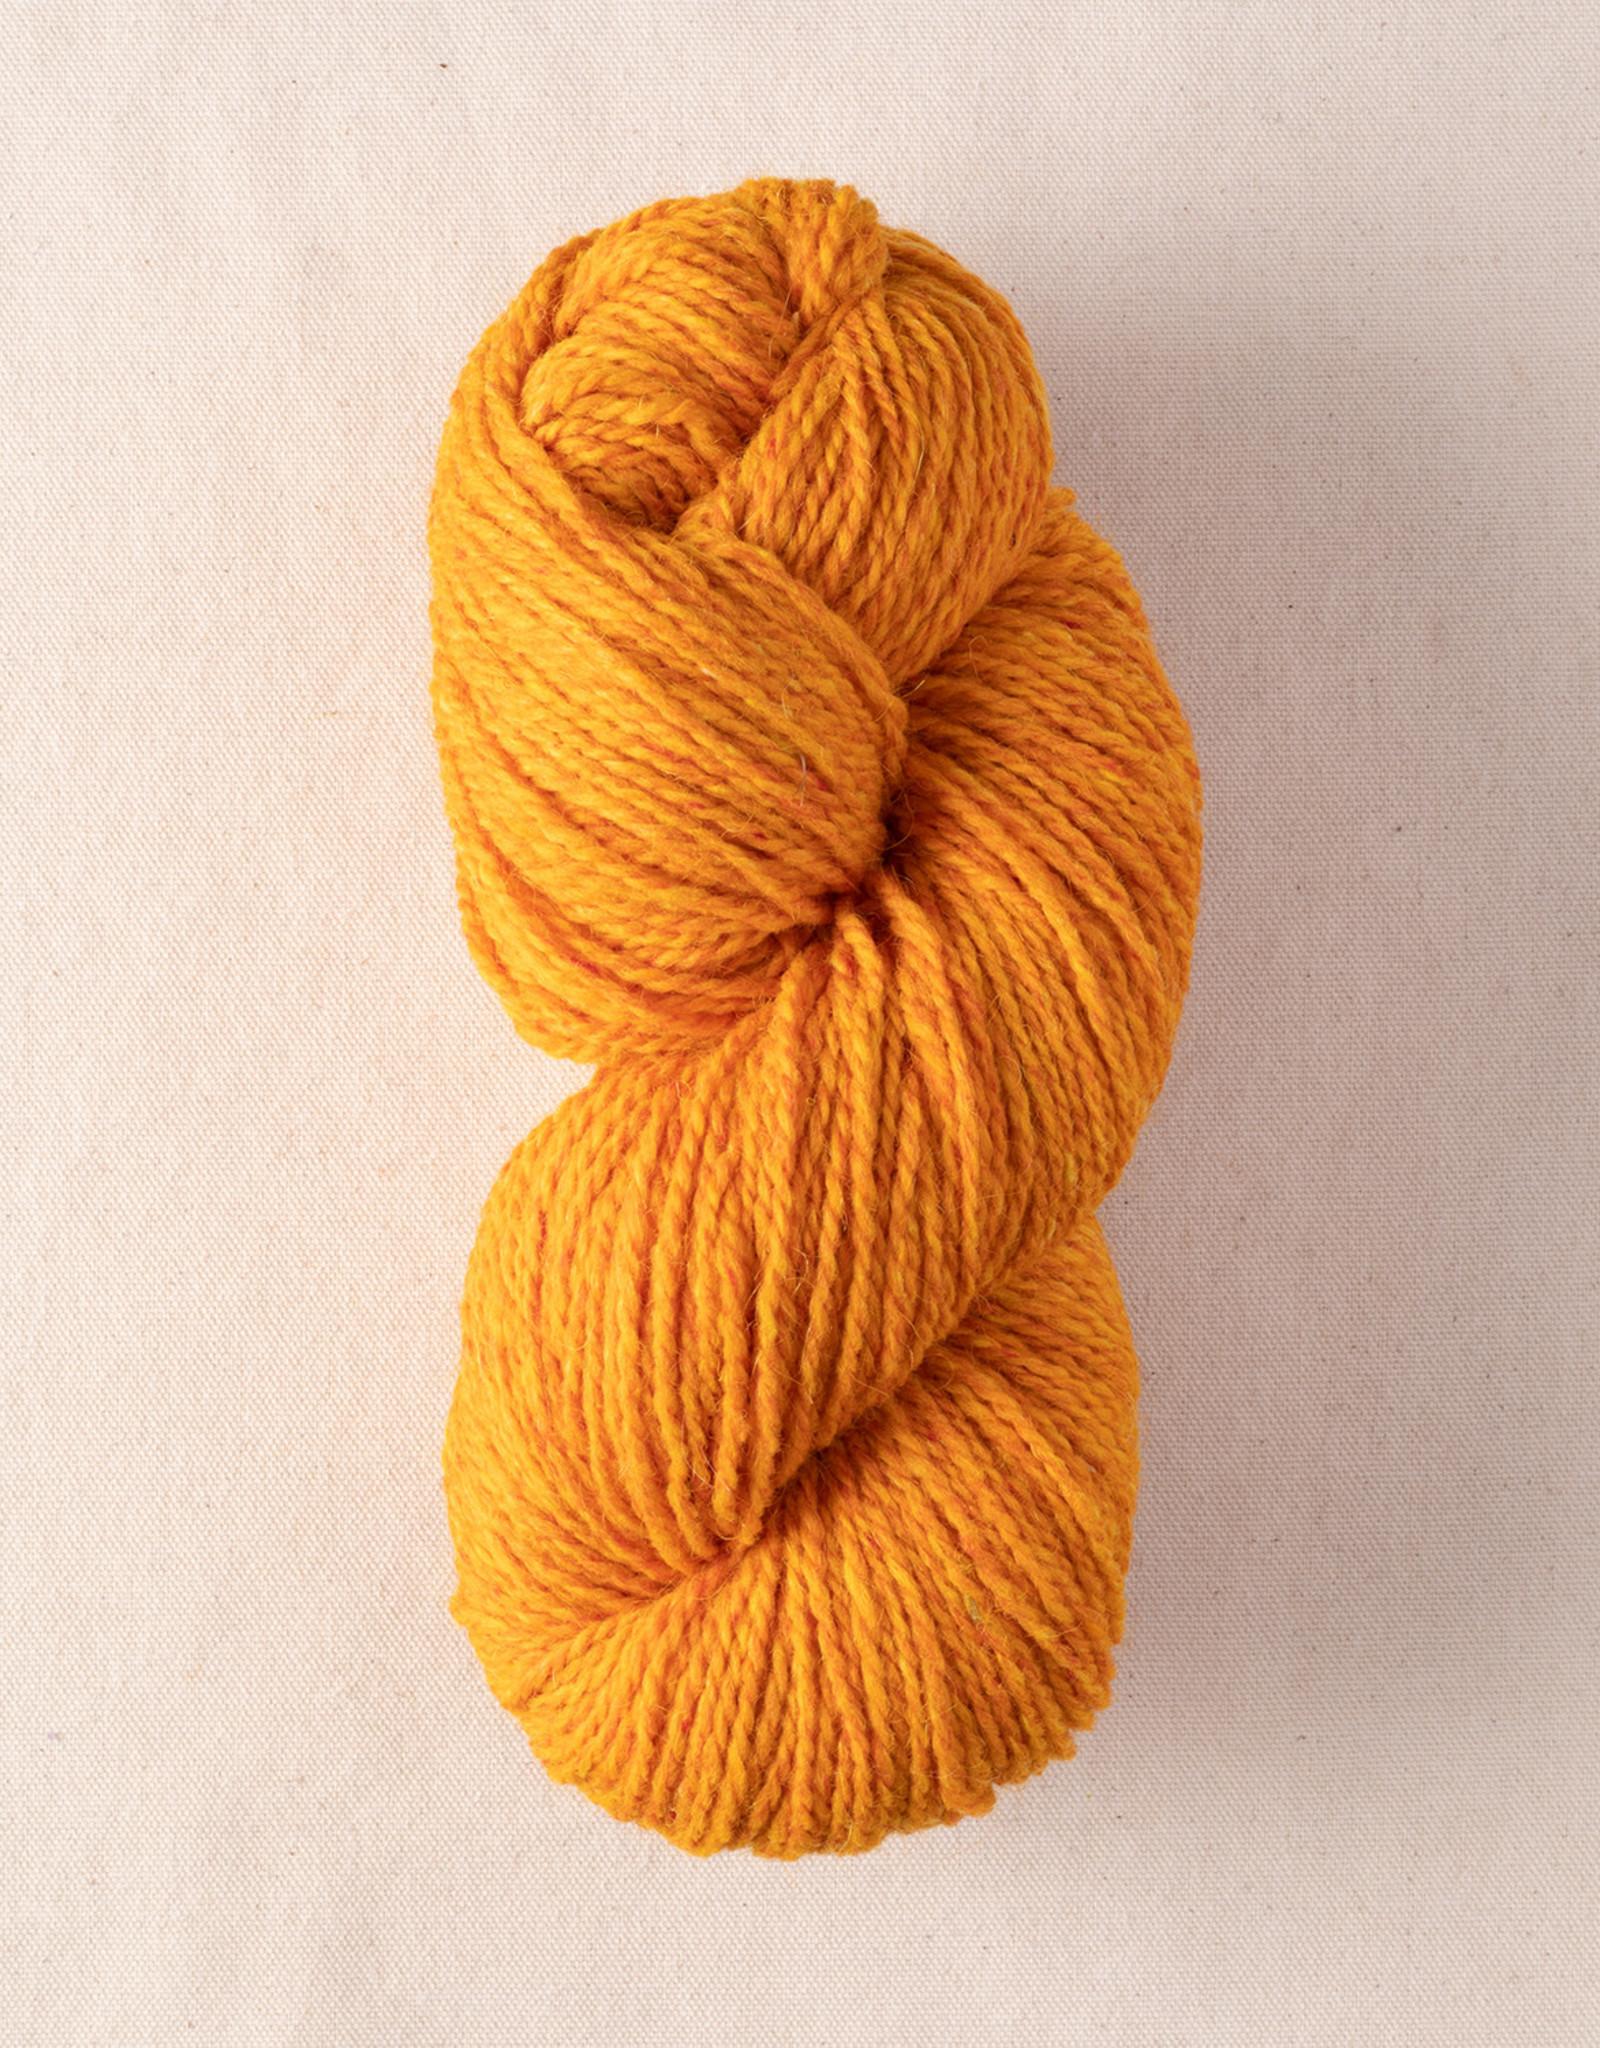 Peace Fleece Wstd 4oz Evening Marigold